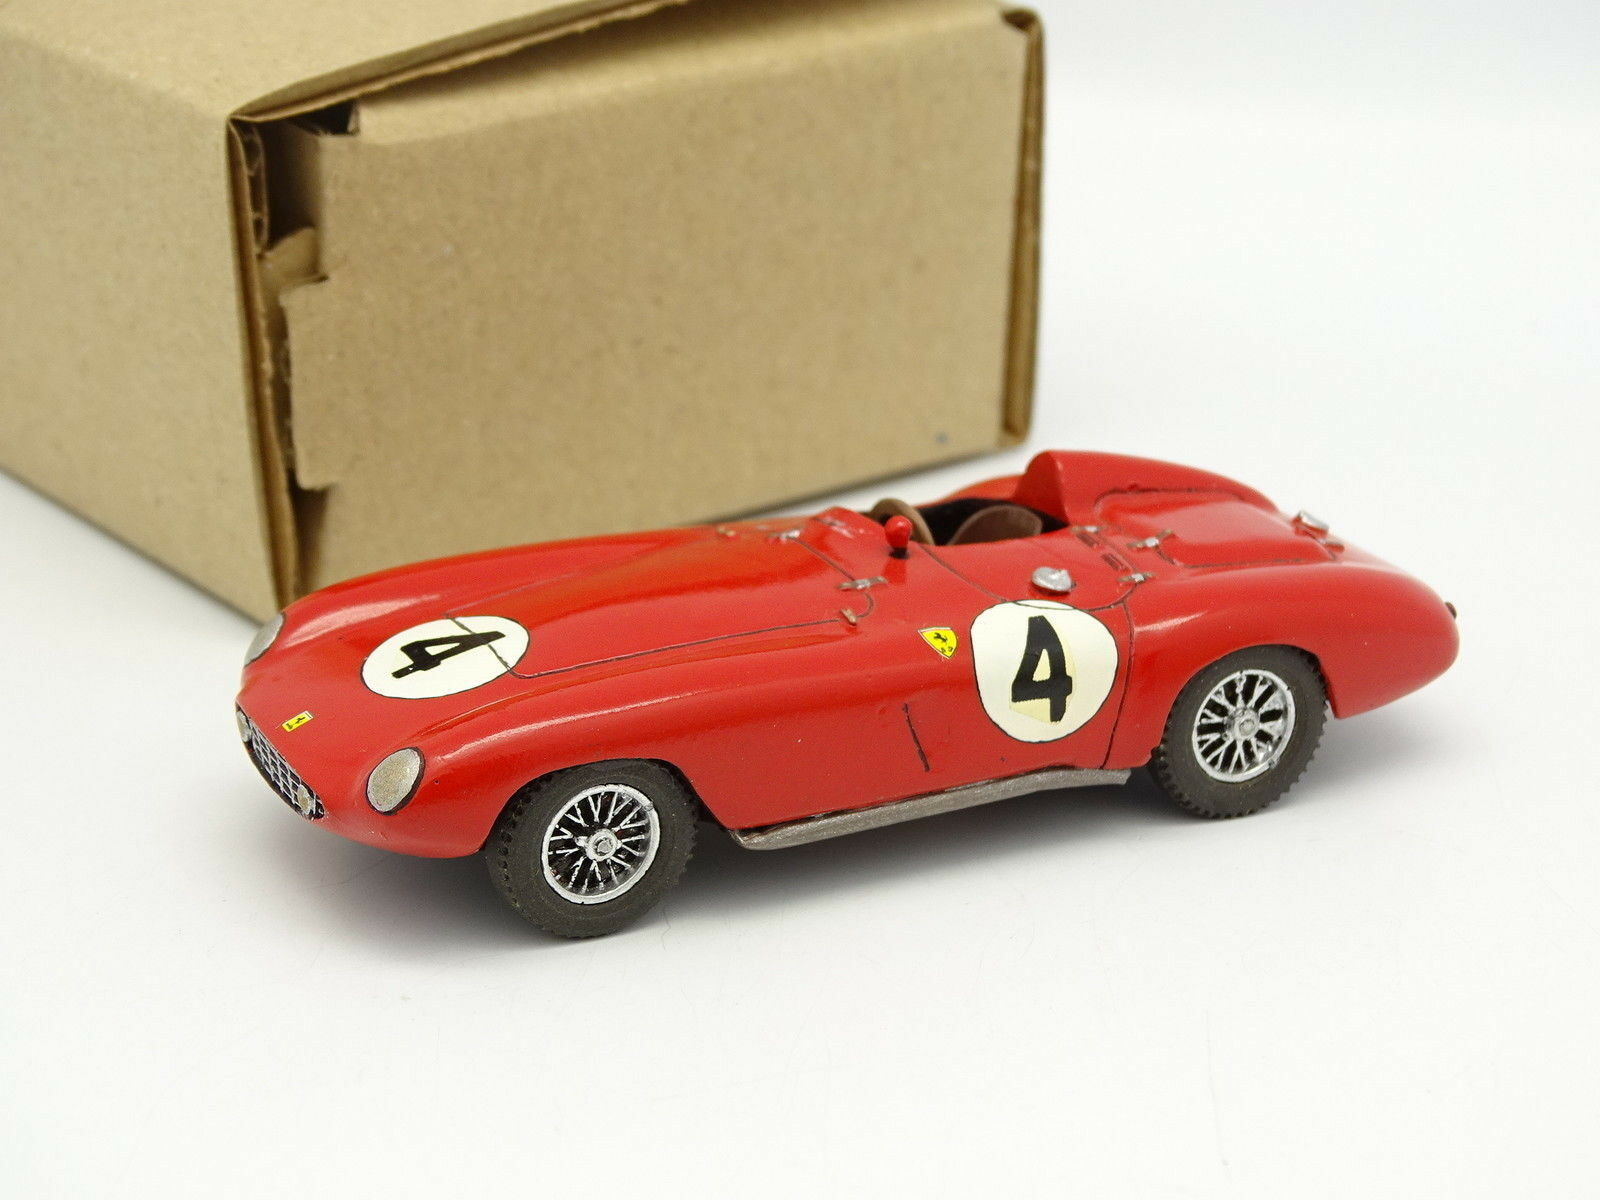 John Day Kit Montado 1 43 - Ferrari 121 LM Le Mans 1955